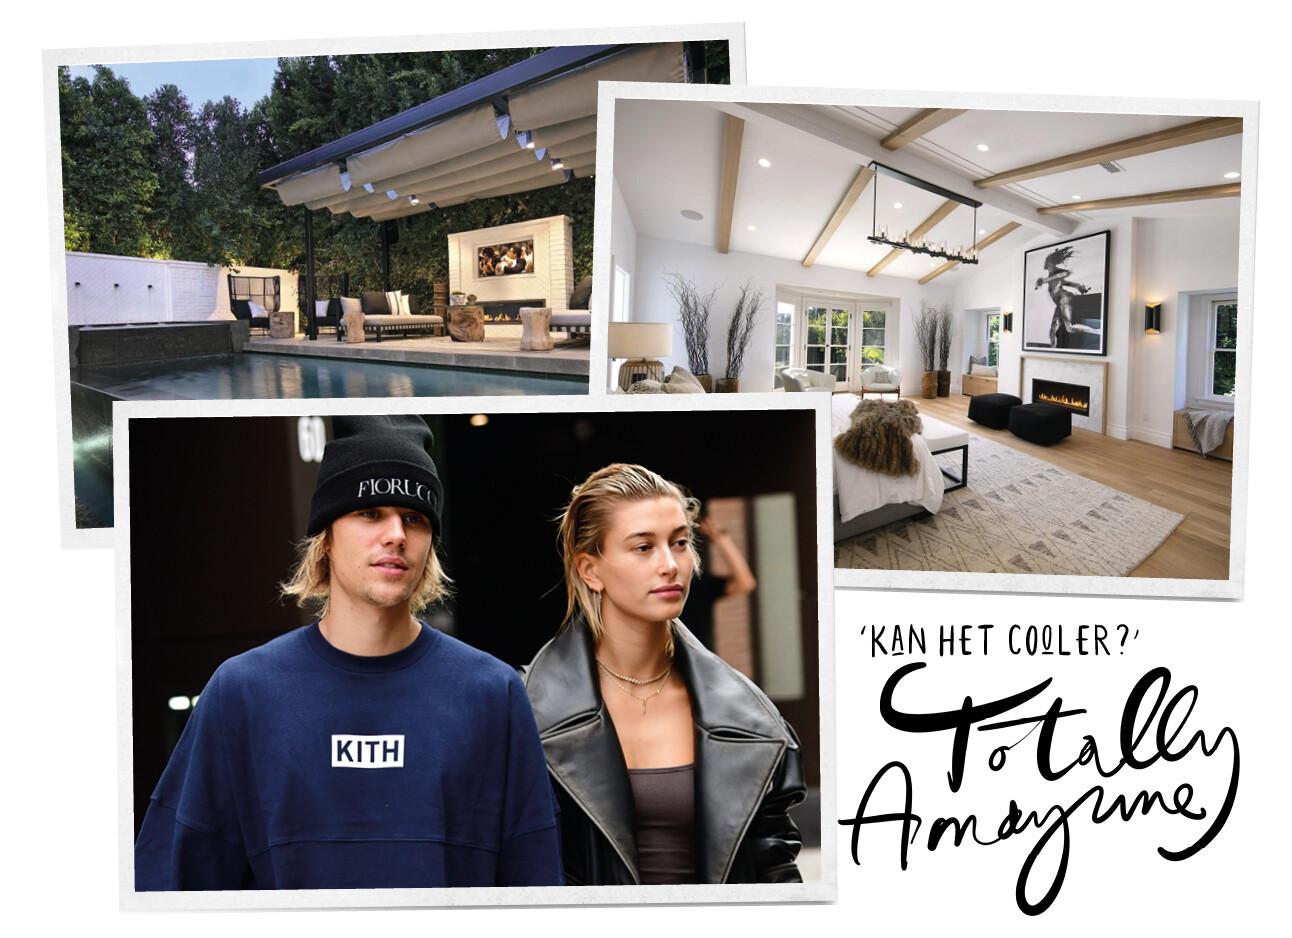 Justin bieber huis for sale